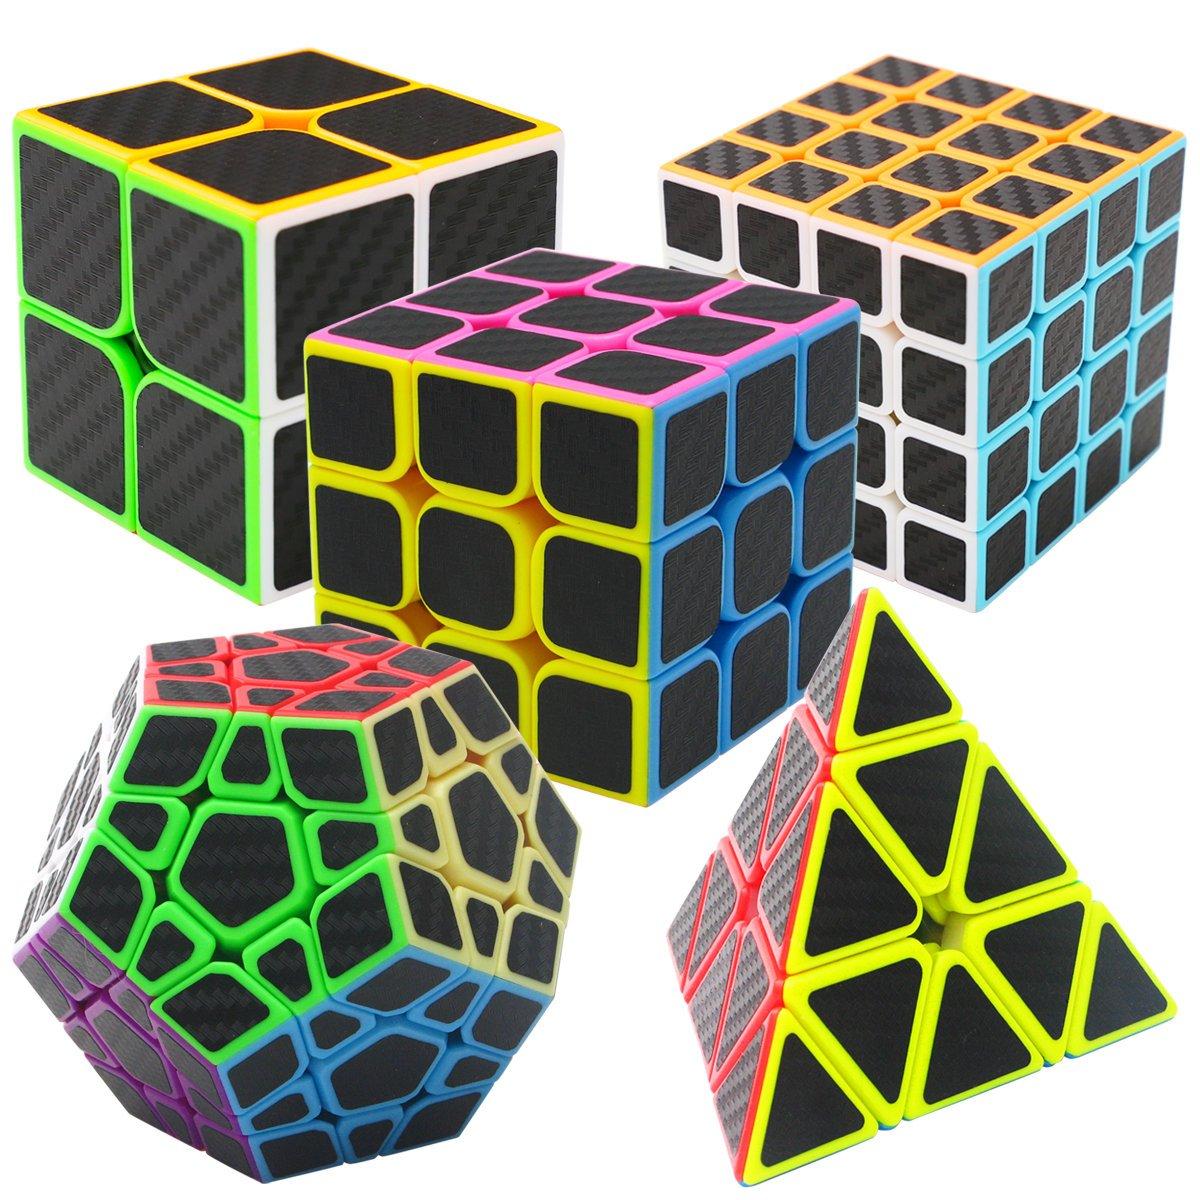 Coolzon Puzzle Cubes Megaminx + Pyraminx + 2x2x2 + 3x3x3 + 4x4x4 5 ...